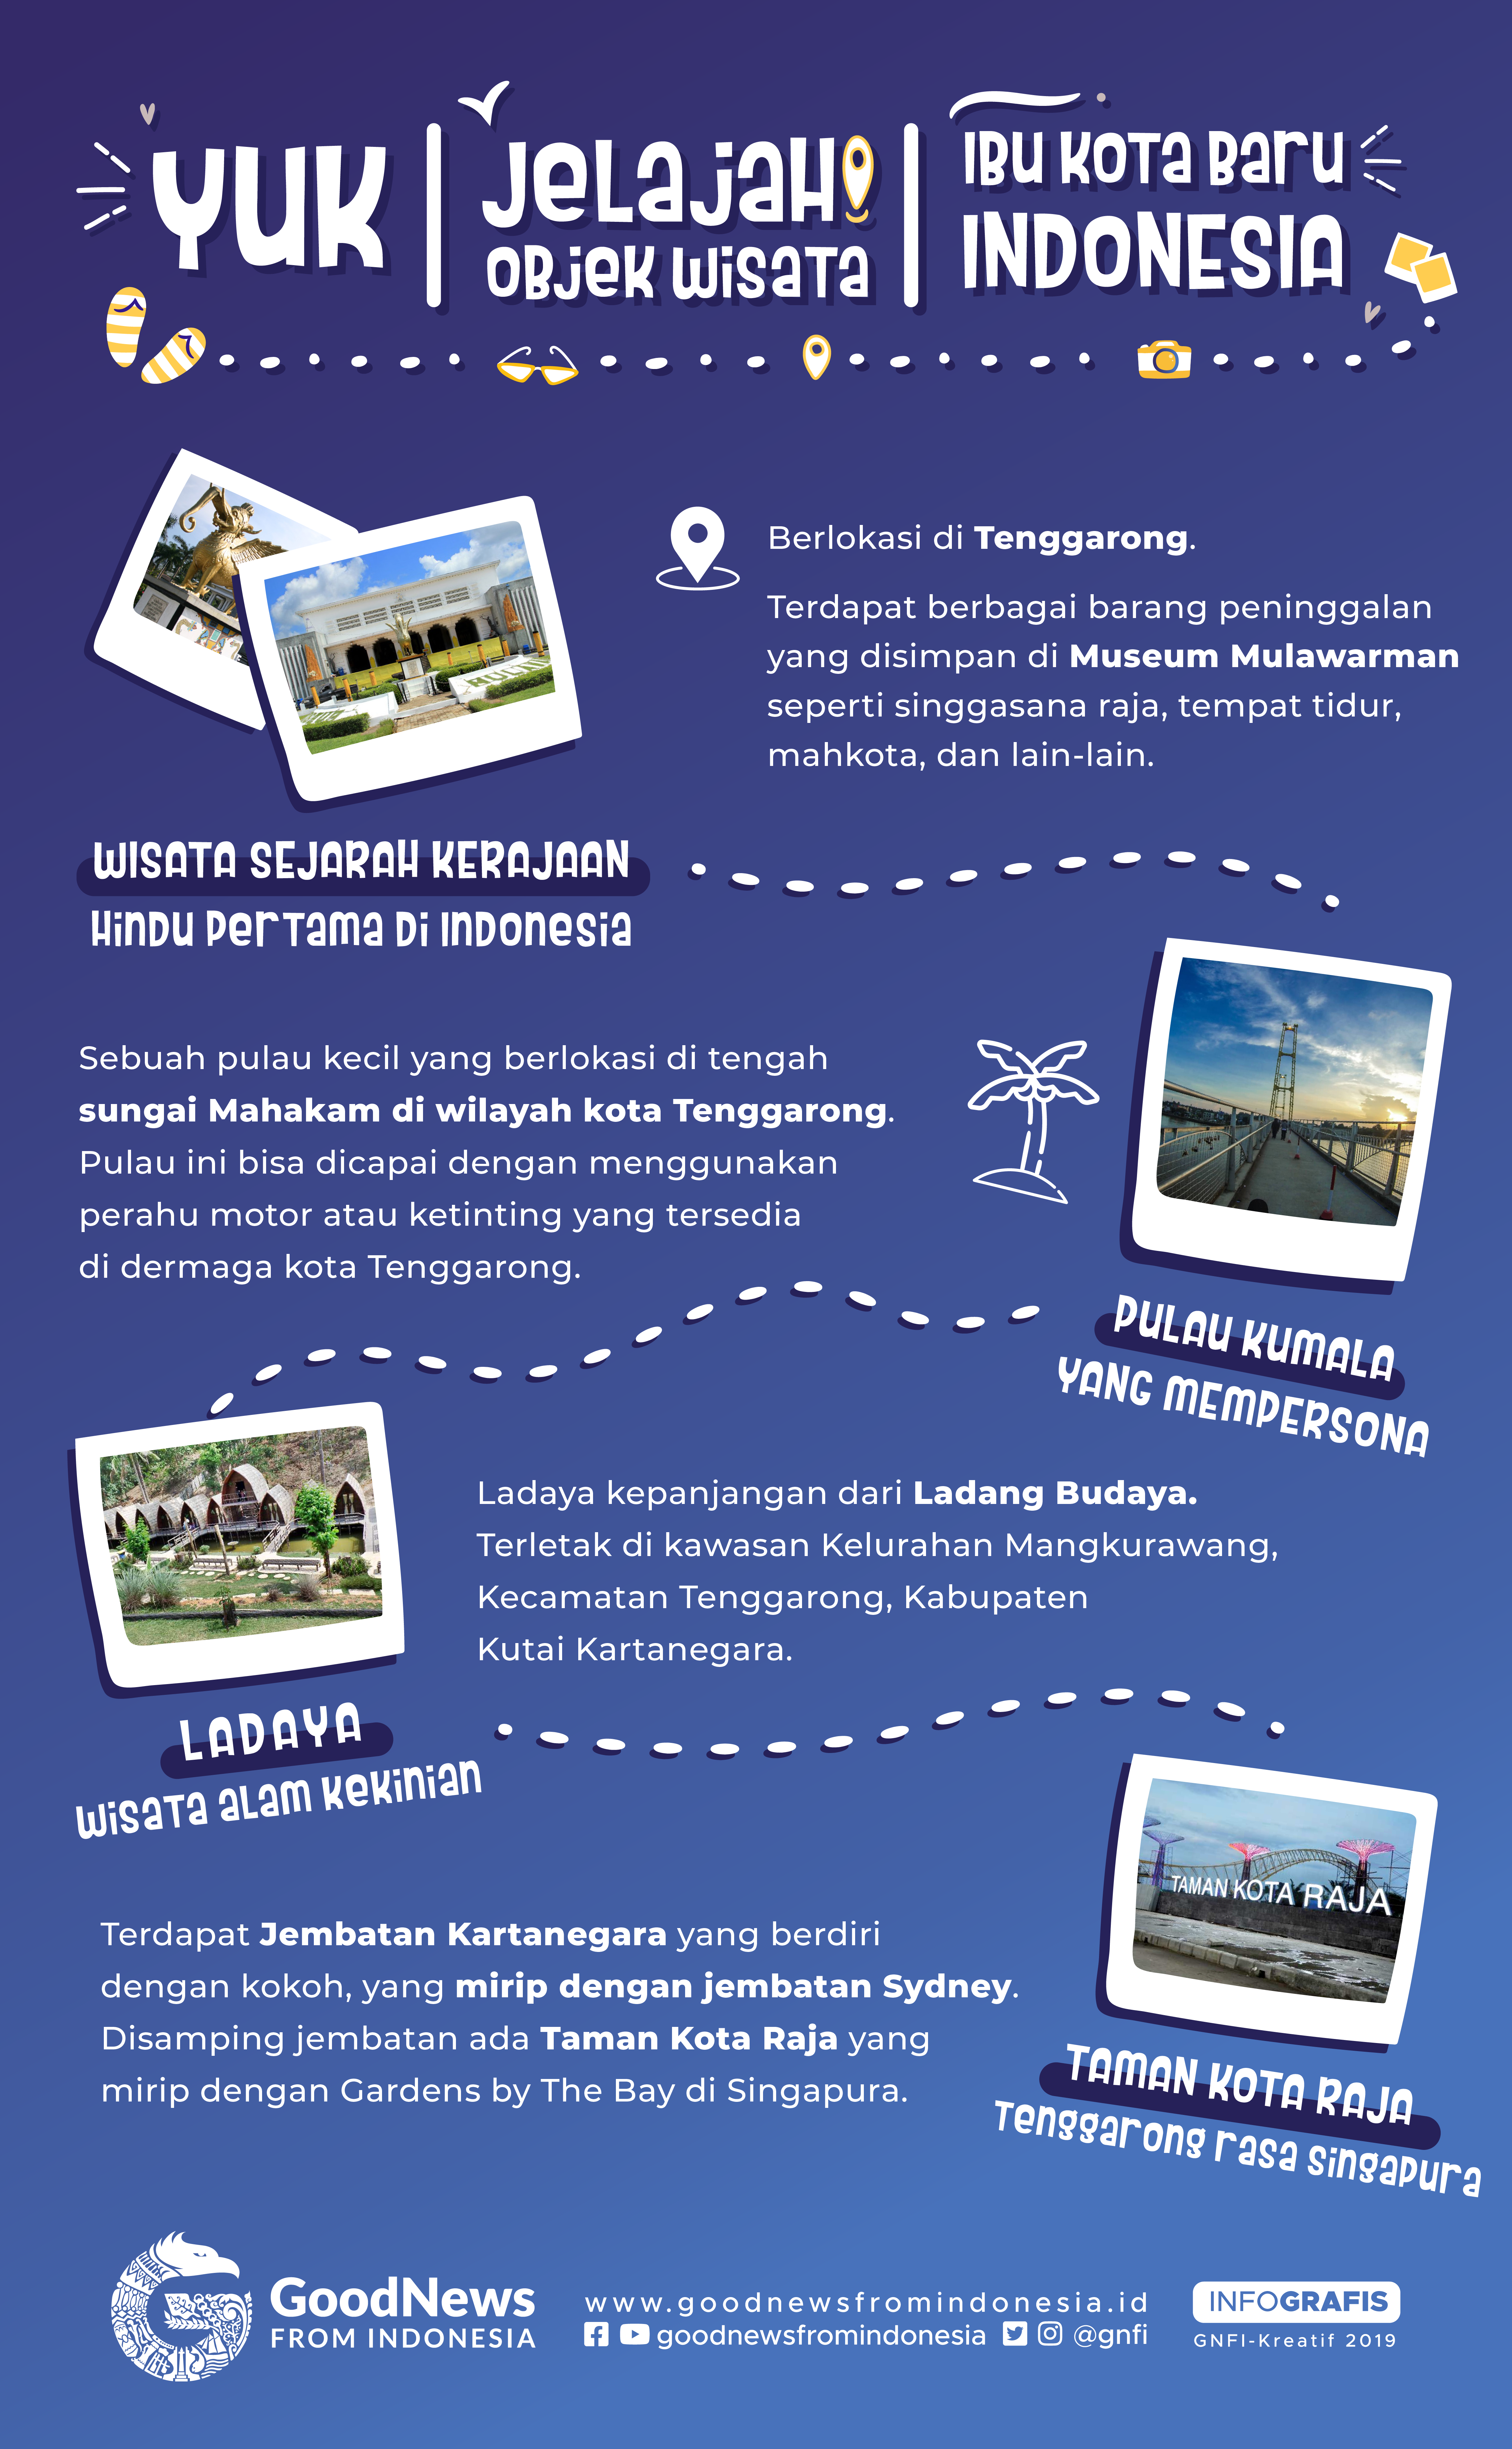 Yuk jelajahi Objek Wisata Ibu Kota Baru Indonesia